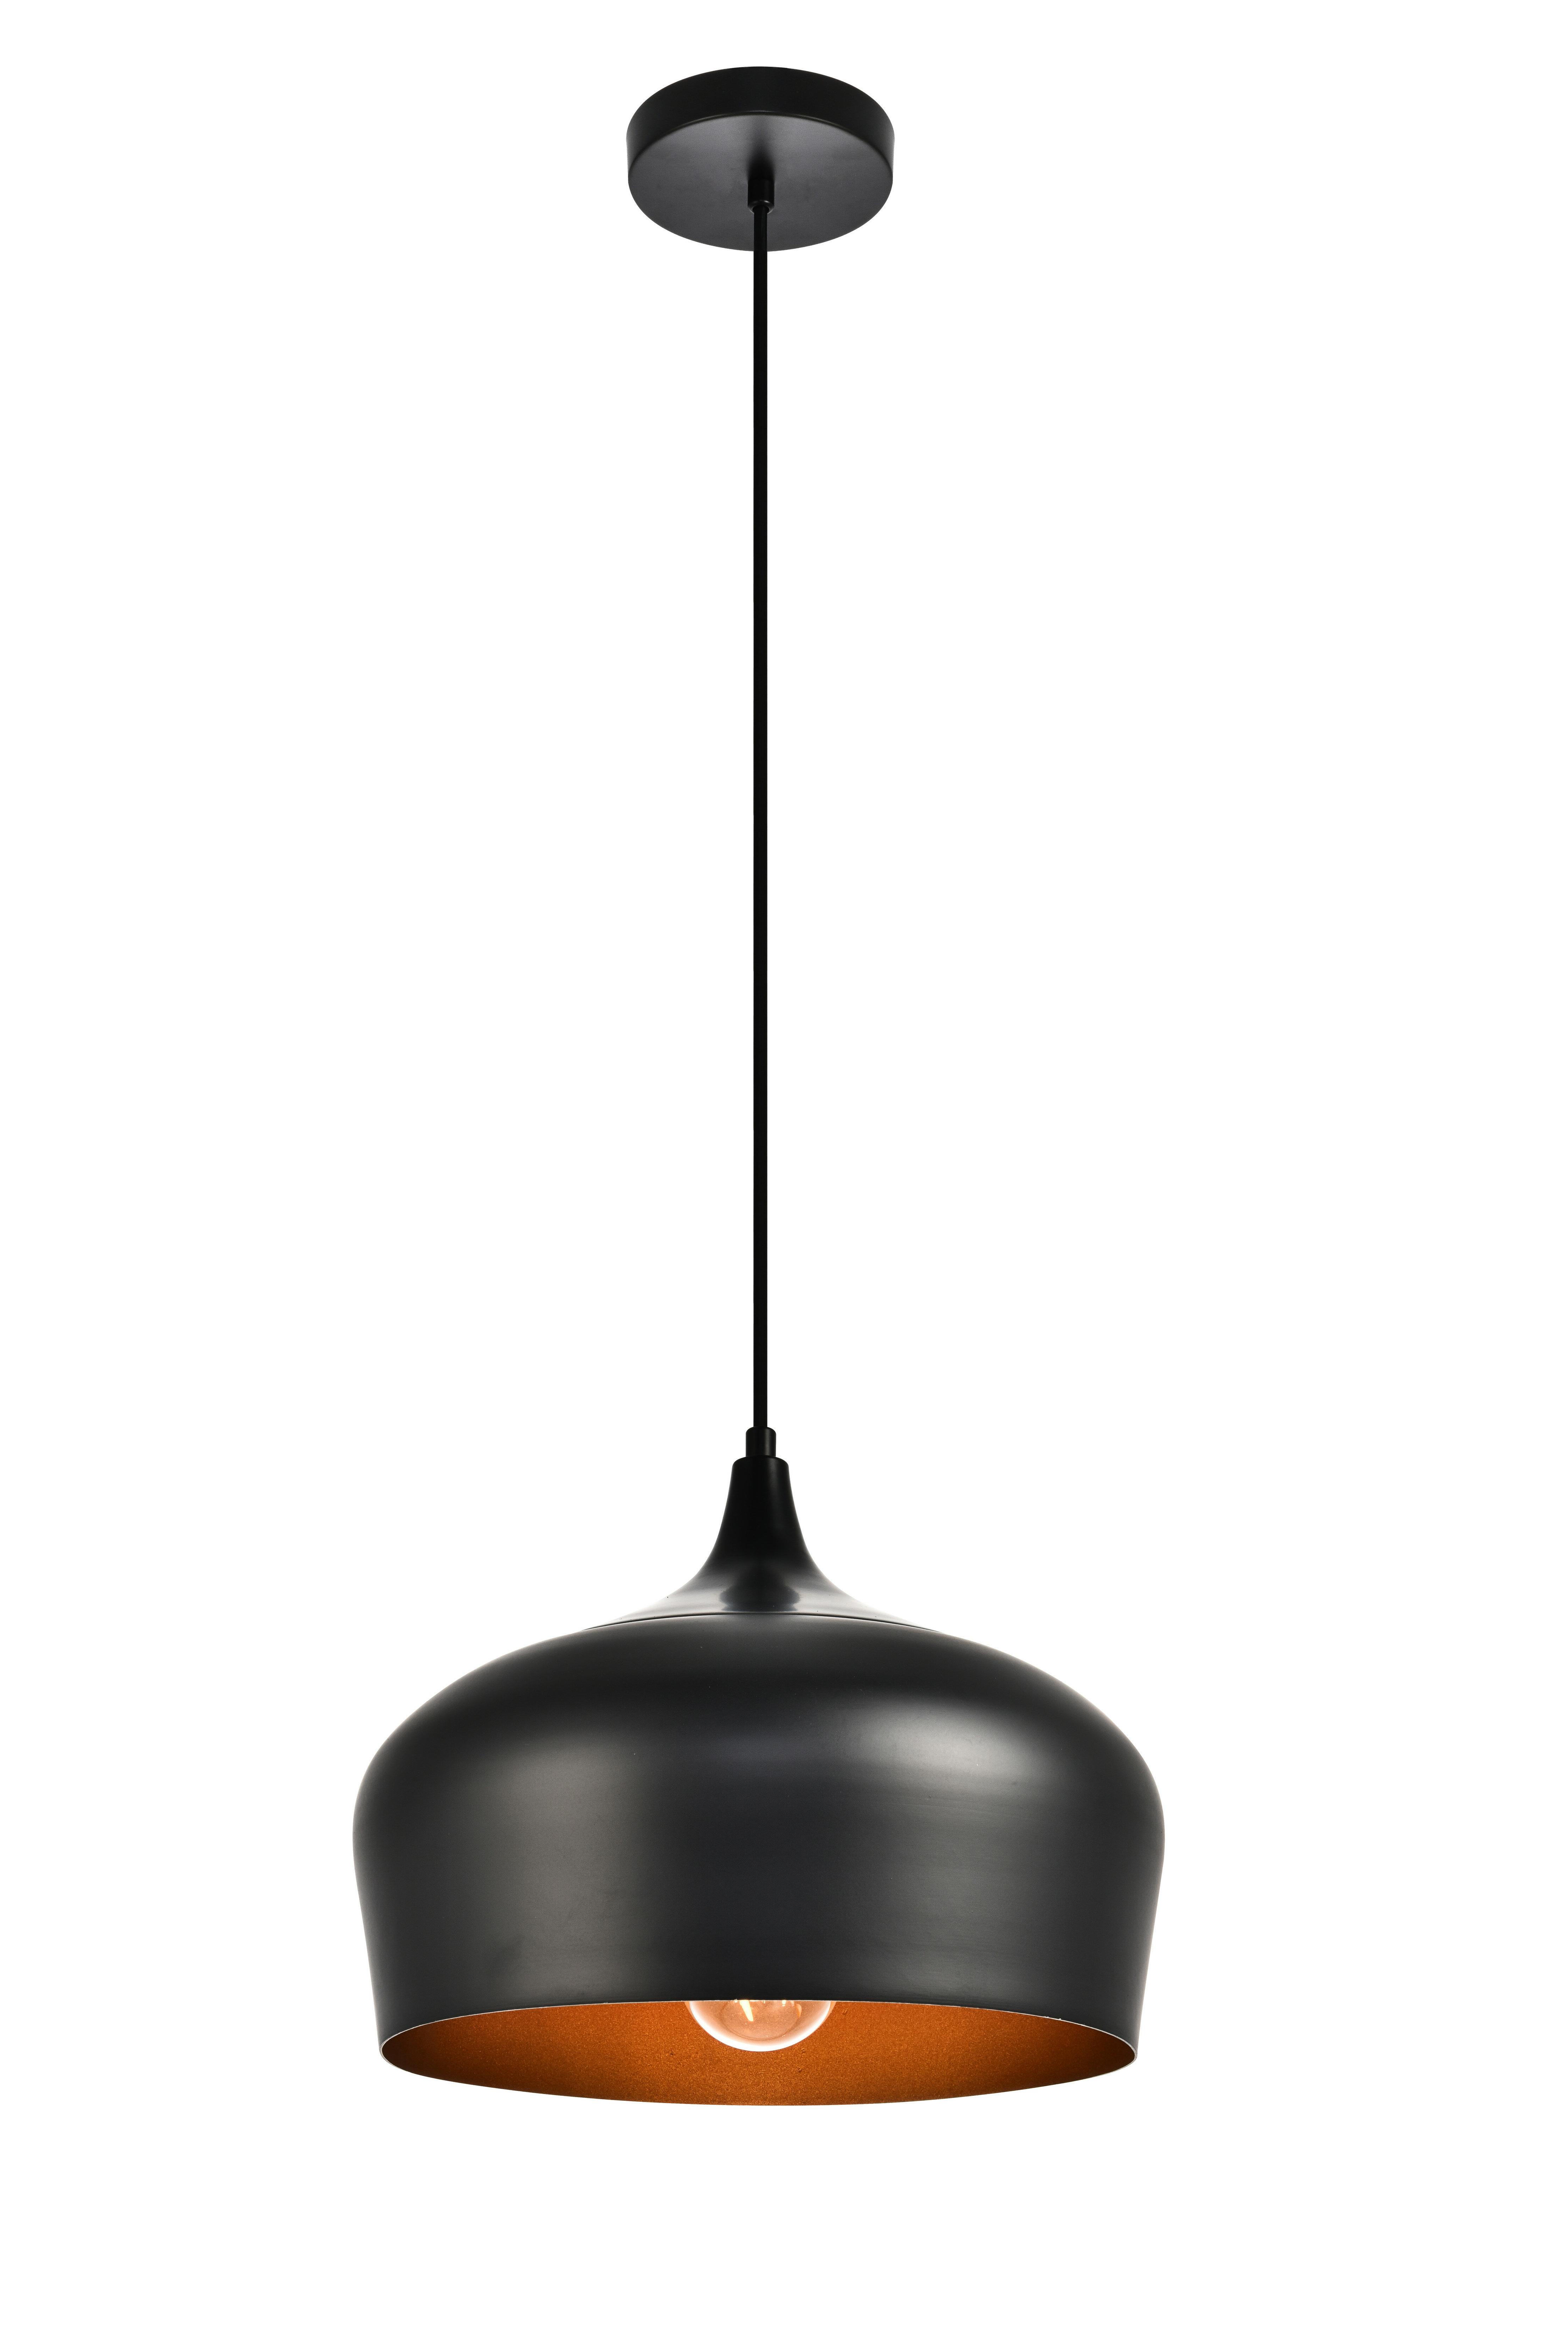 Knoxville 1 Light Single Teardrop Pendants Throughout Well Known Jordan 1 Light Single Teardrop Pendant (Gallery 4 of 25)